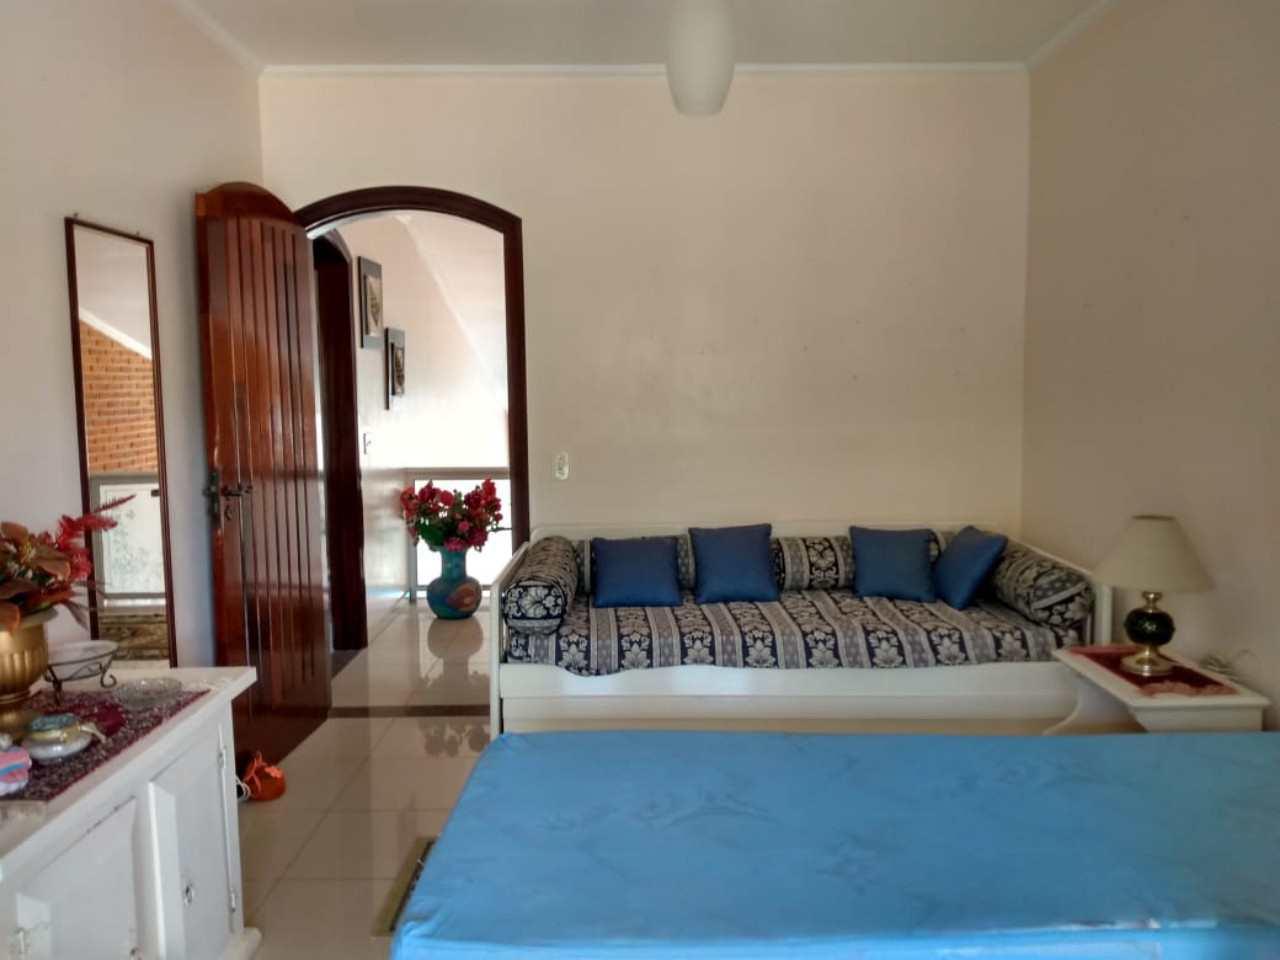 Casa com 4 dorms, Jardim Virgínia, Guarujá - R$ 790 mil, Cod: 5131